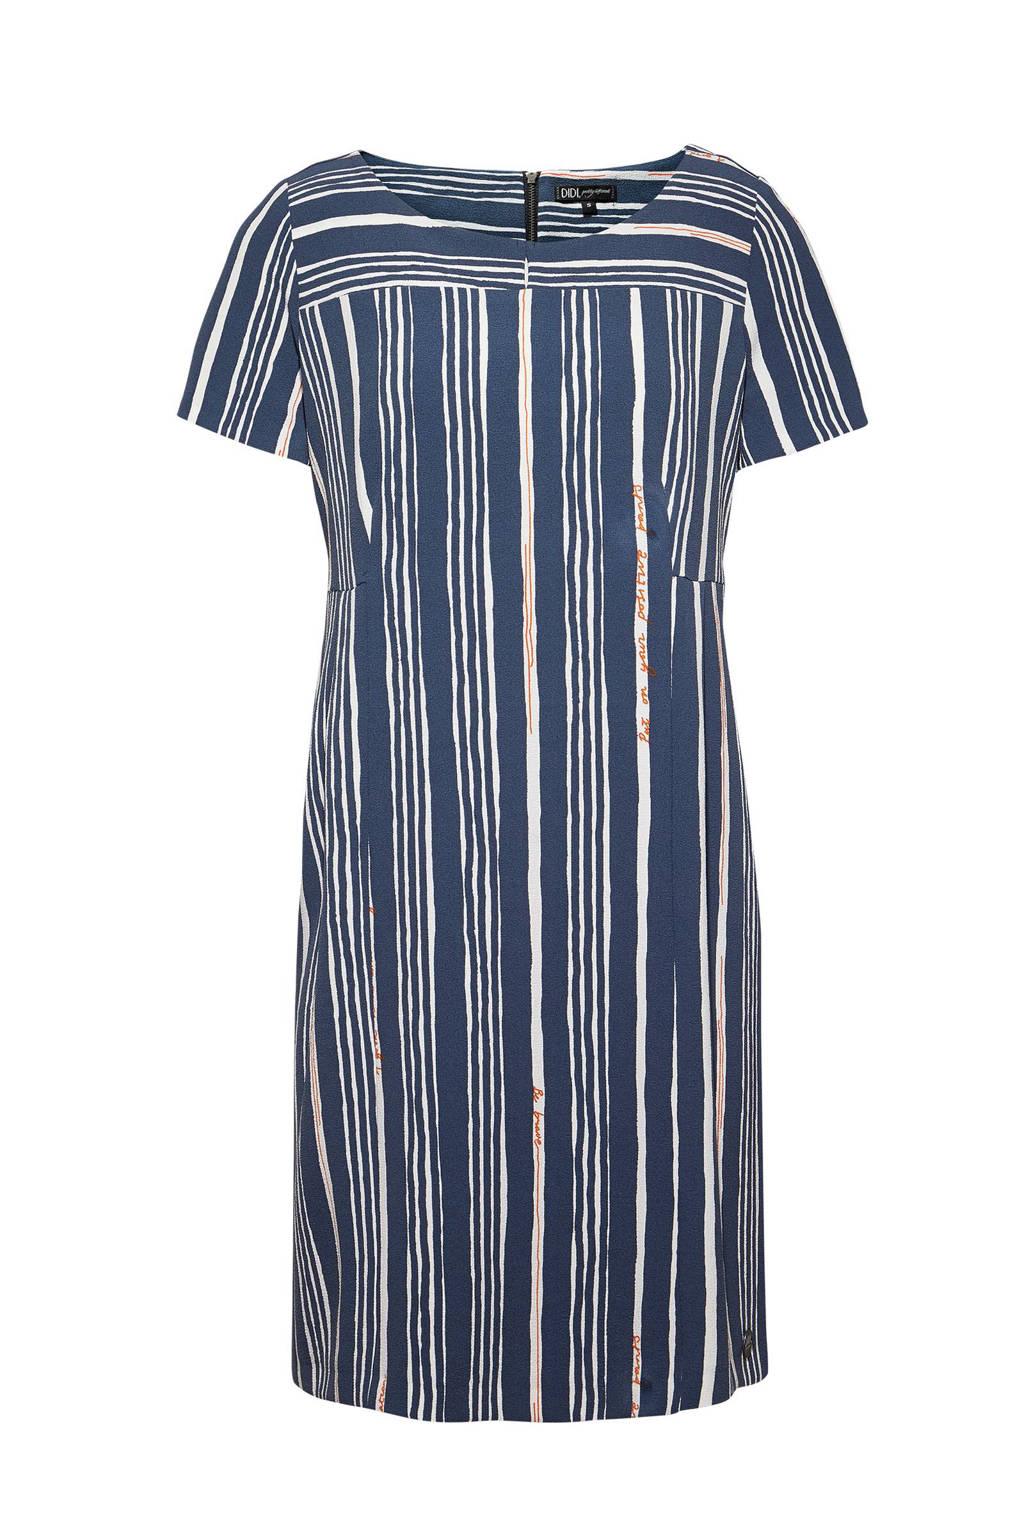 Didi gestreepte jurk donkerblauw, Donkerblauw/wit